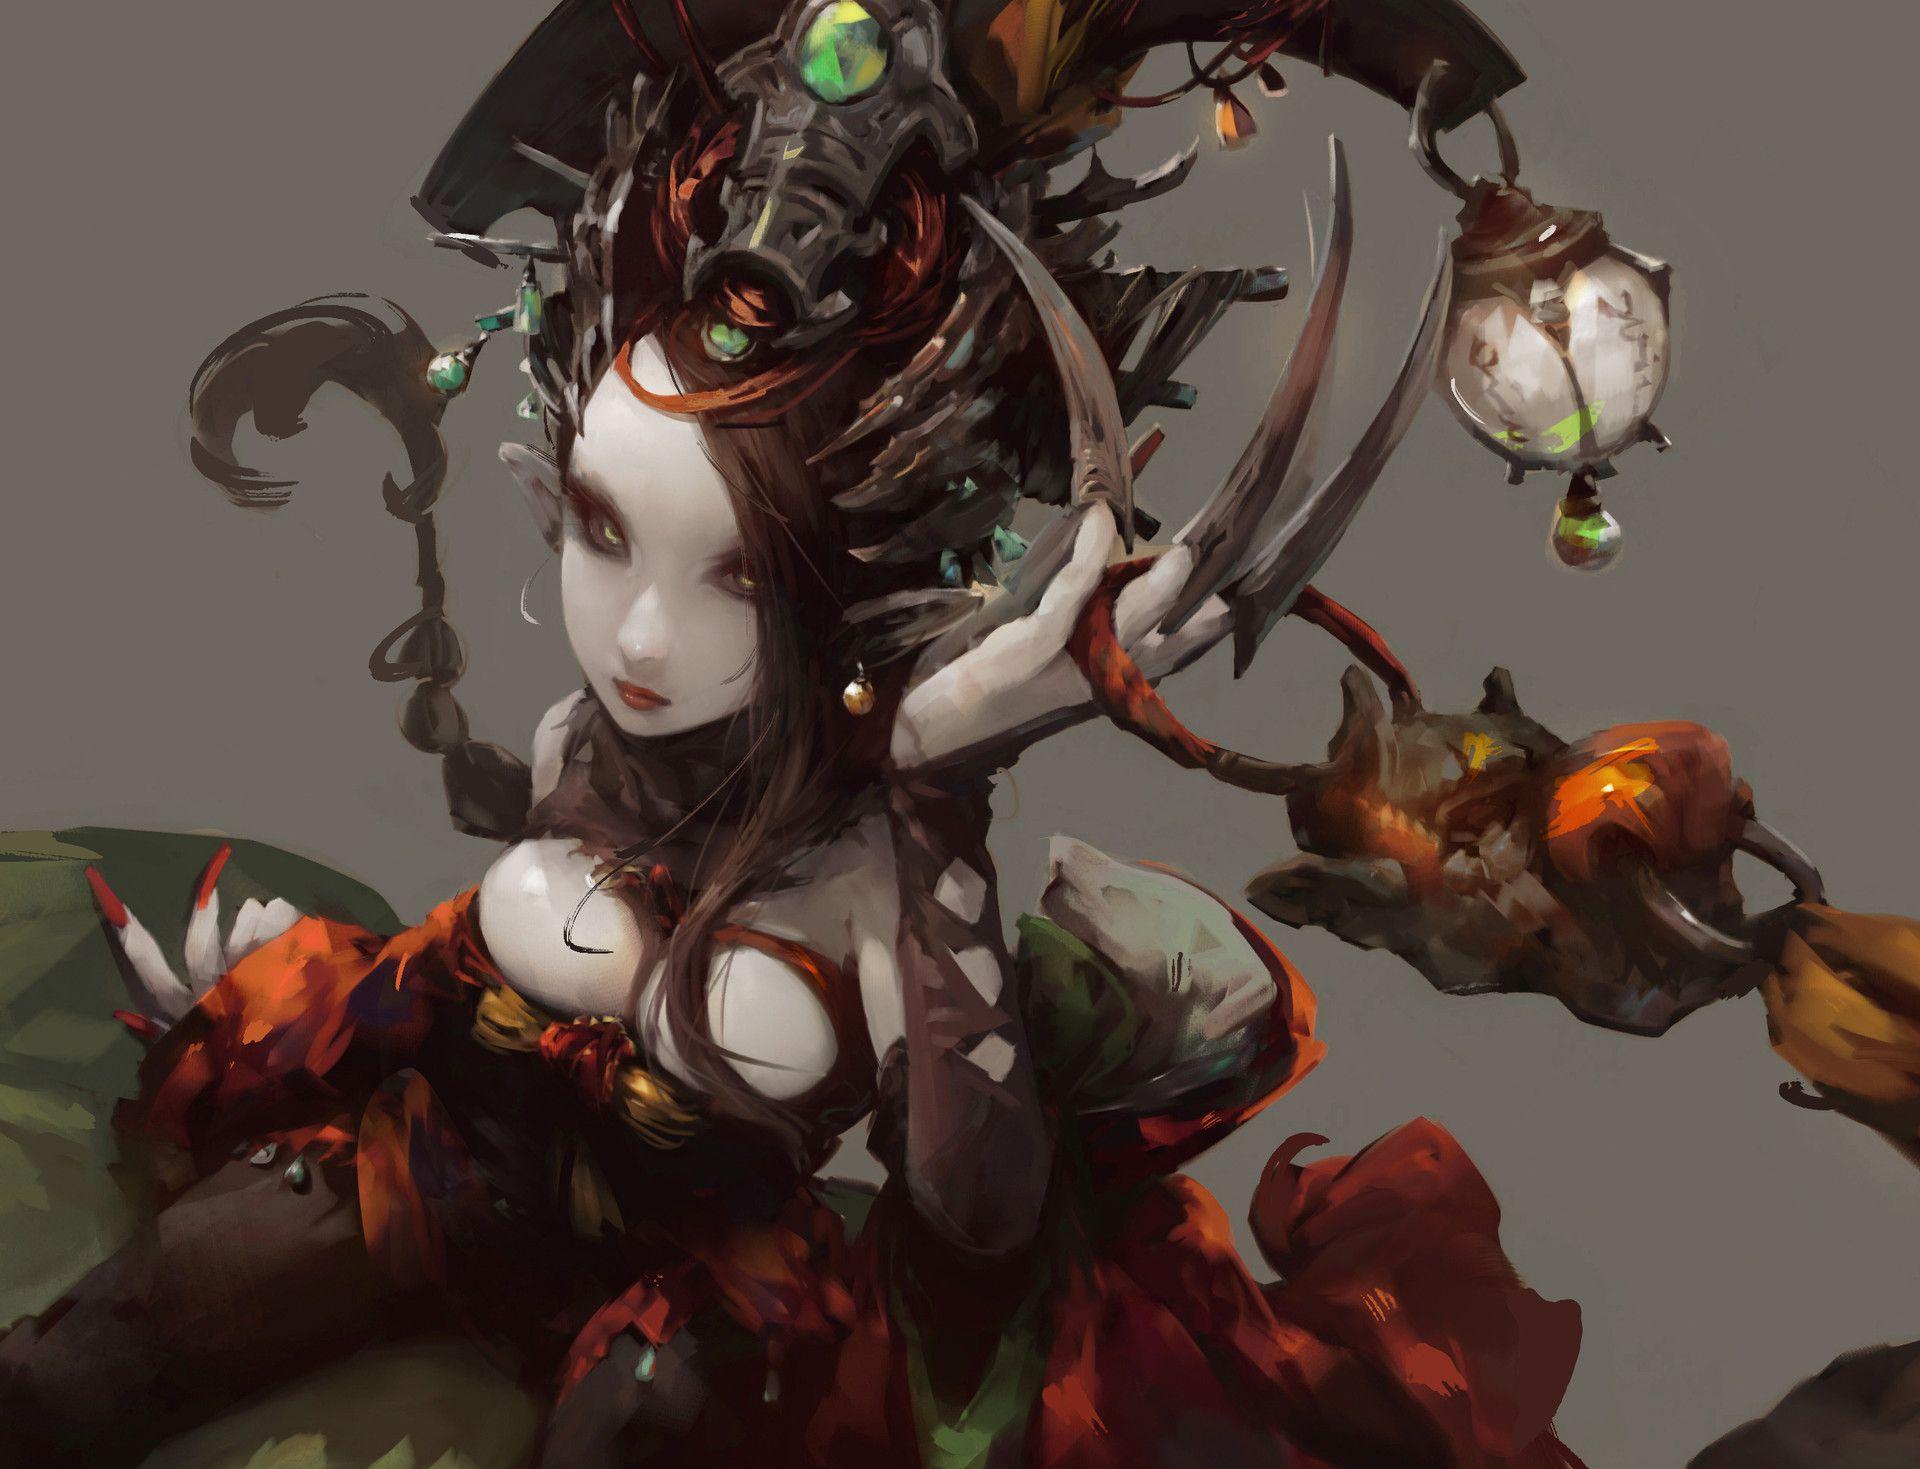 ArtStation - 鐵扇公主 - Princess Iron Fan, HJ Huang